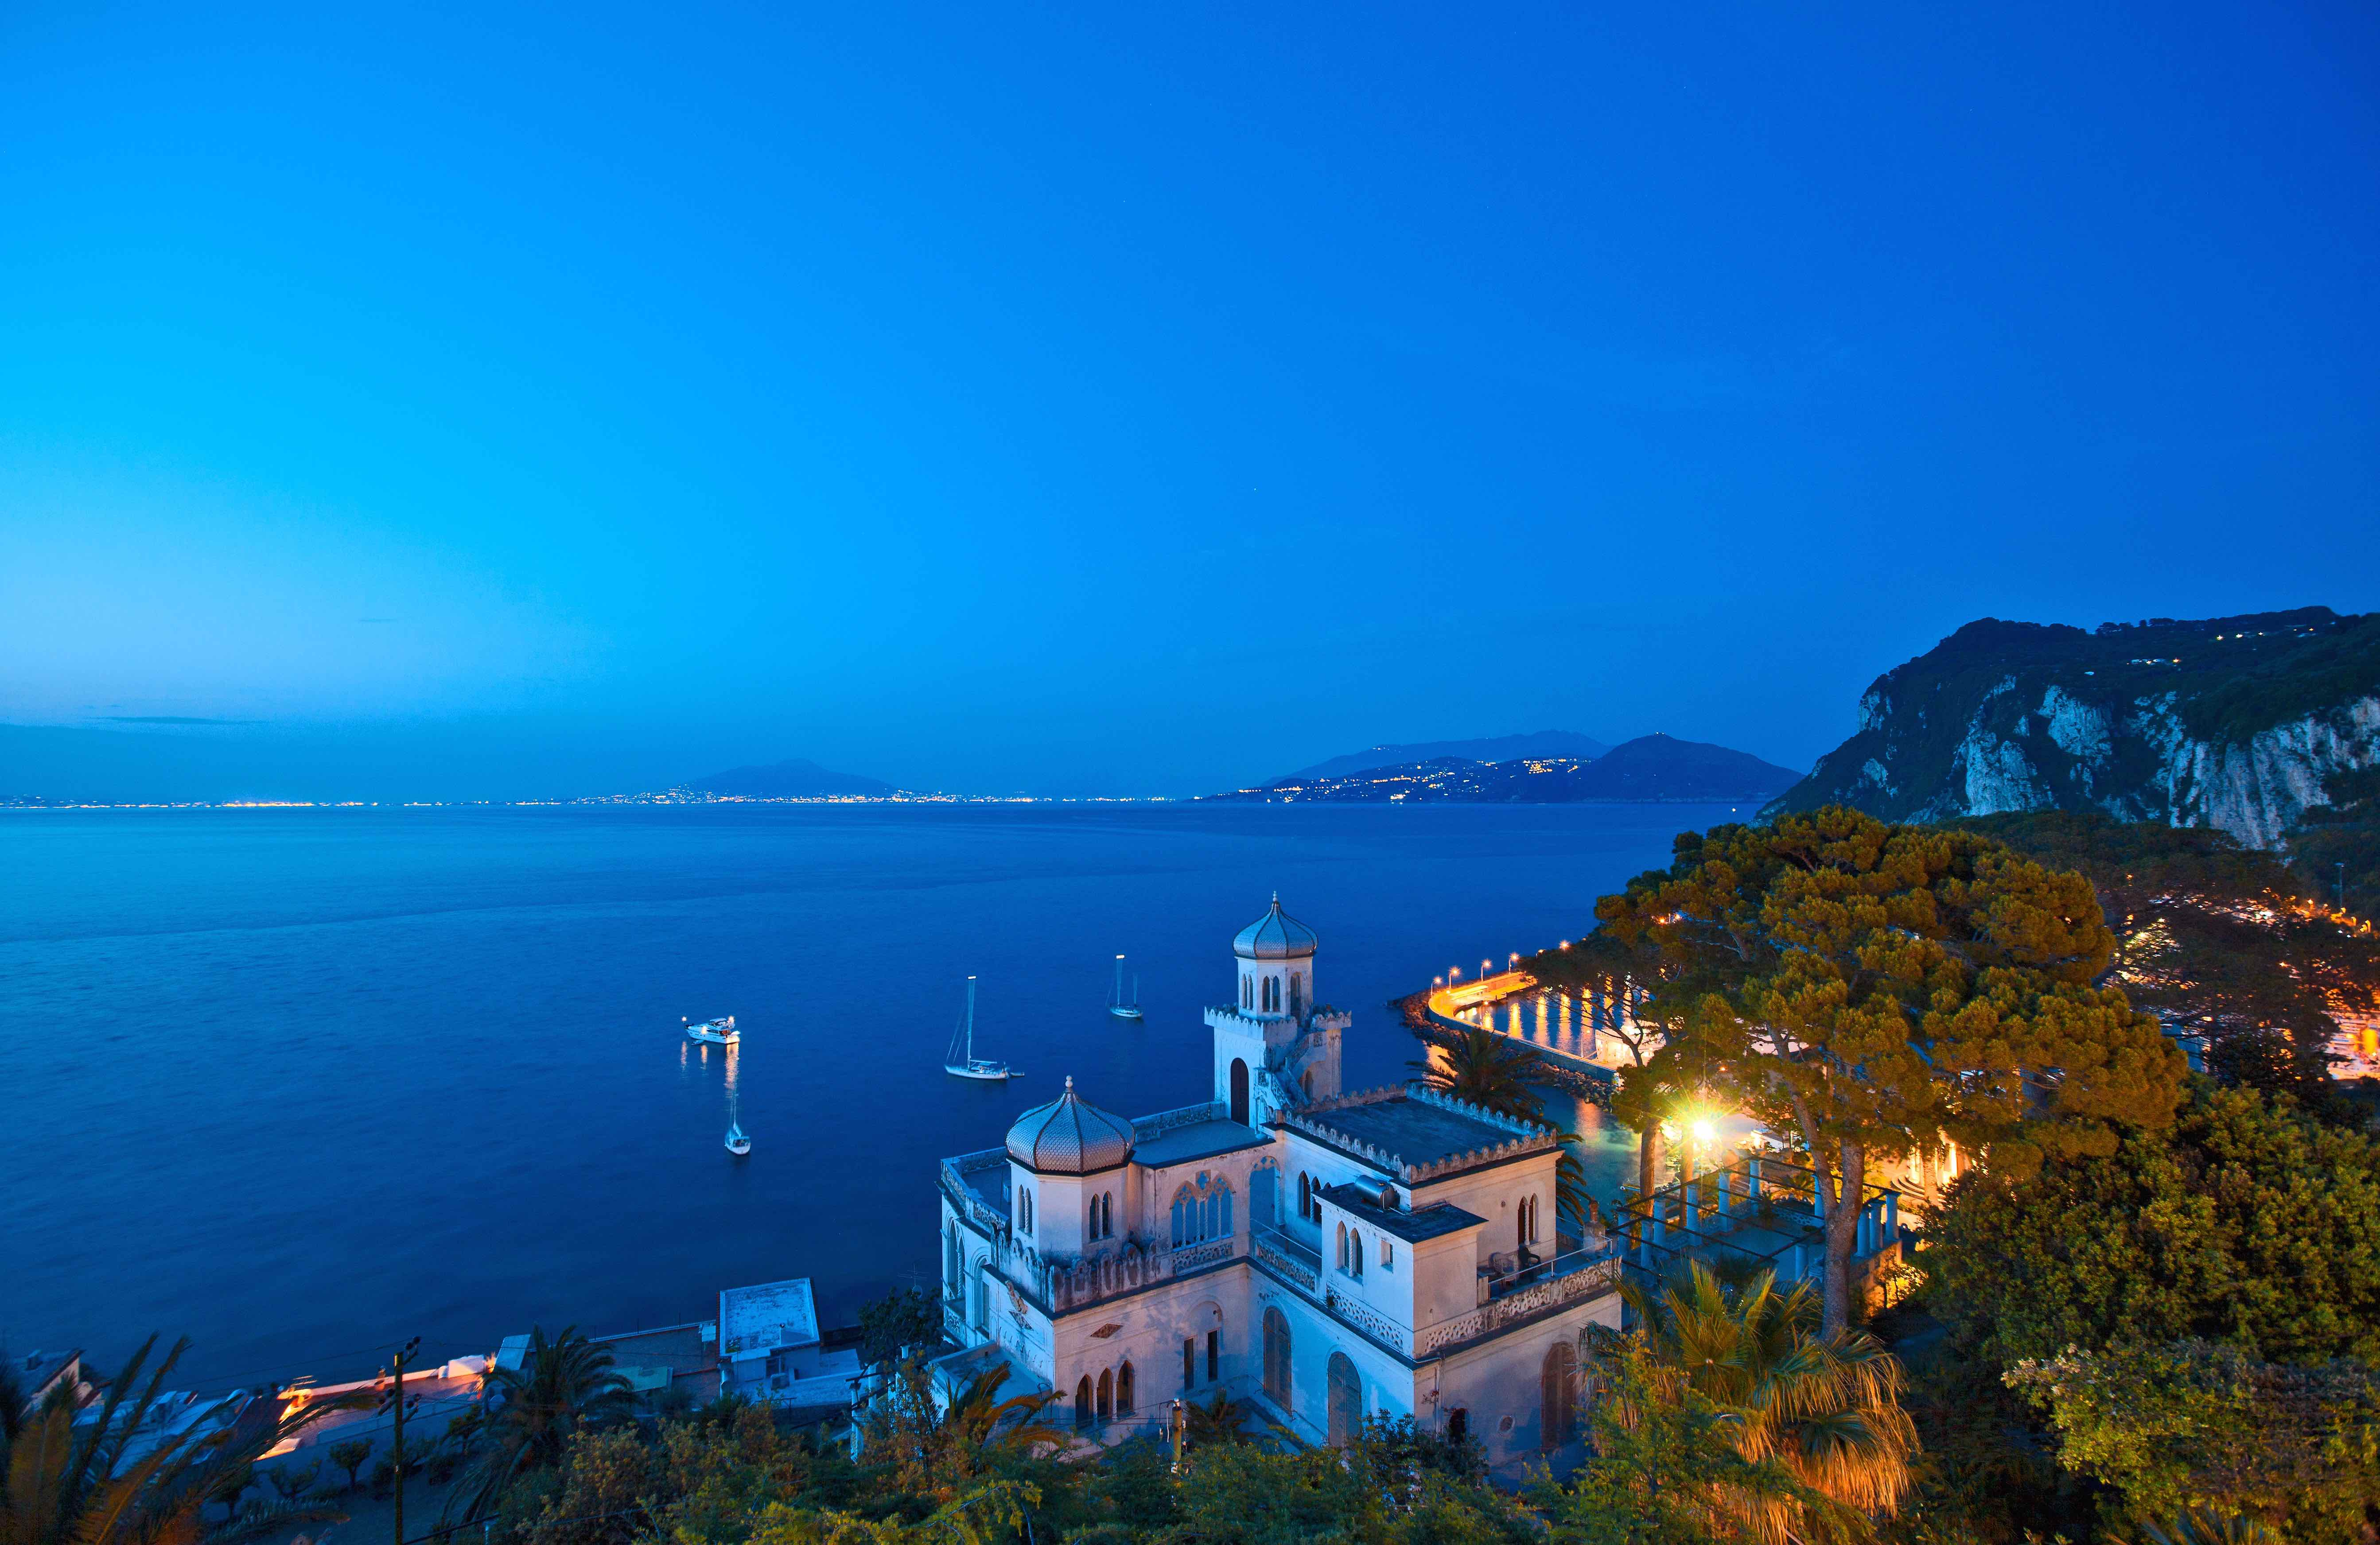 Capri. L'Excelsior Parco entra nella collezione presieduta da Ducasse: Chateaux & Hotels Collection